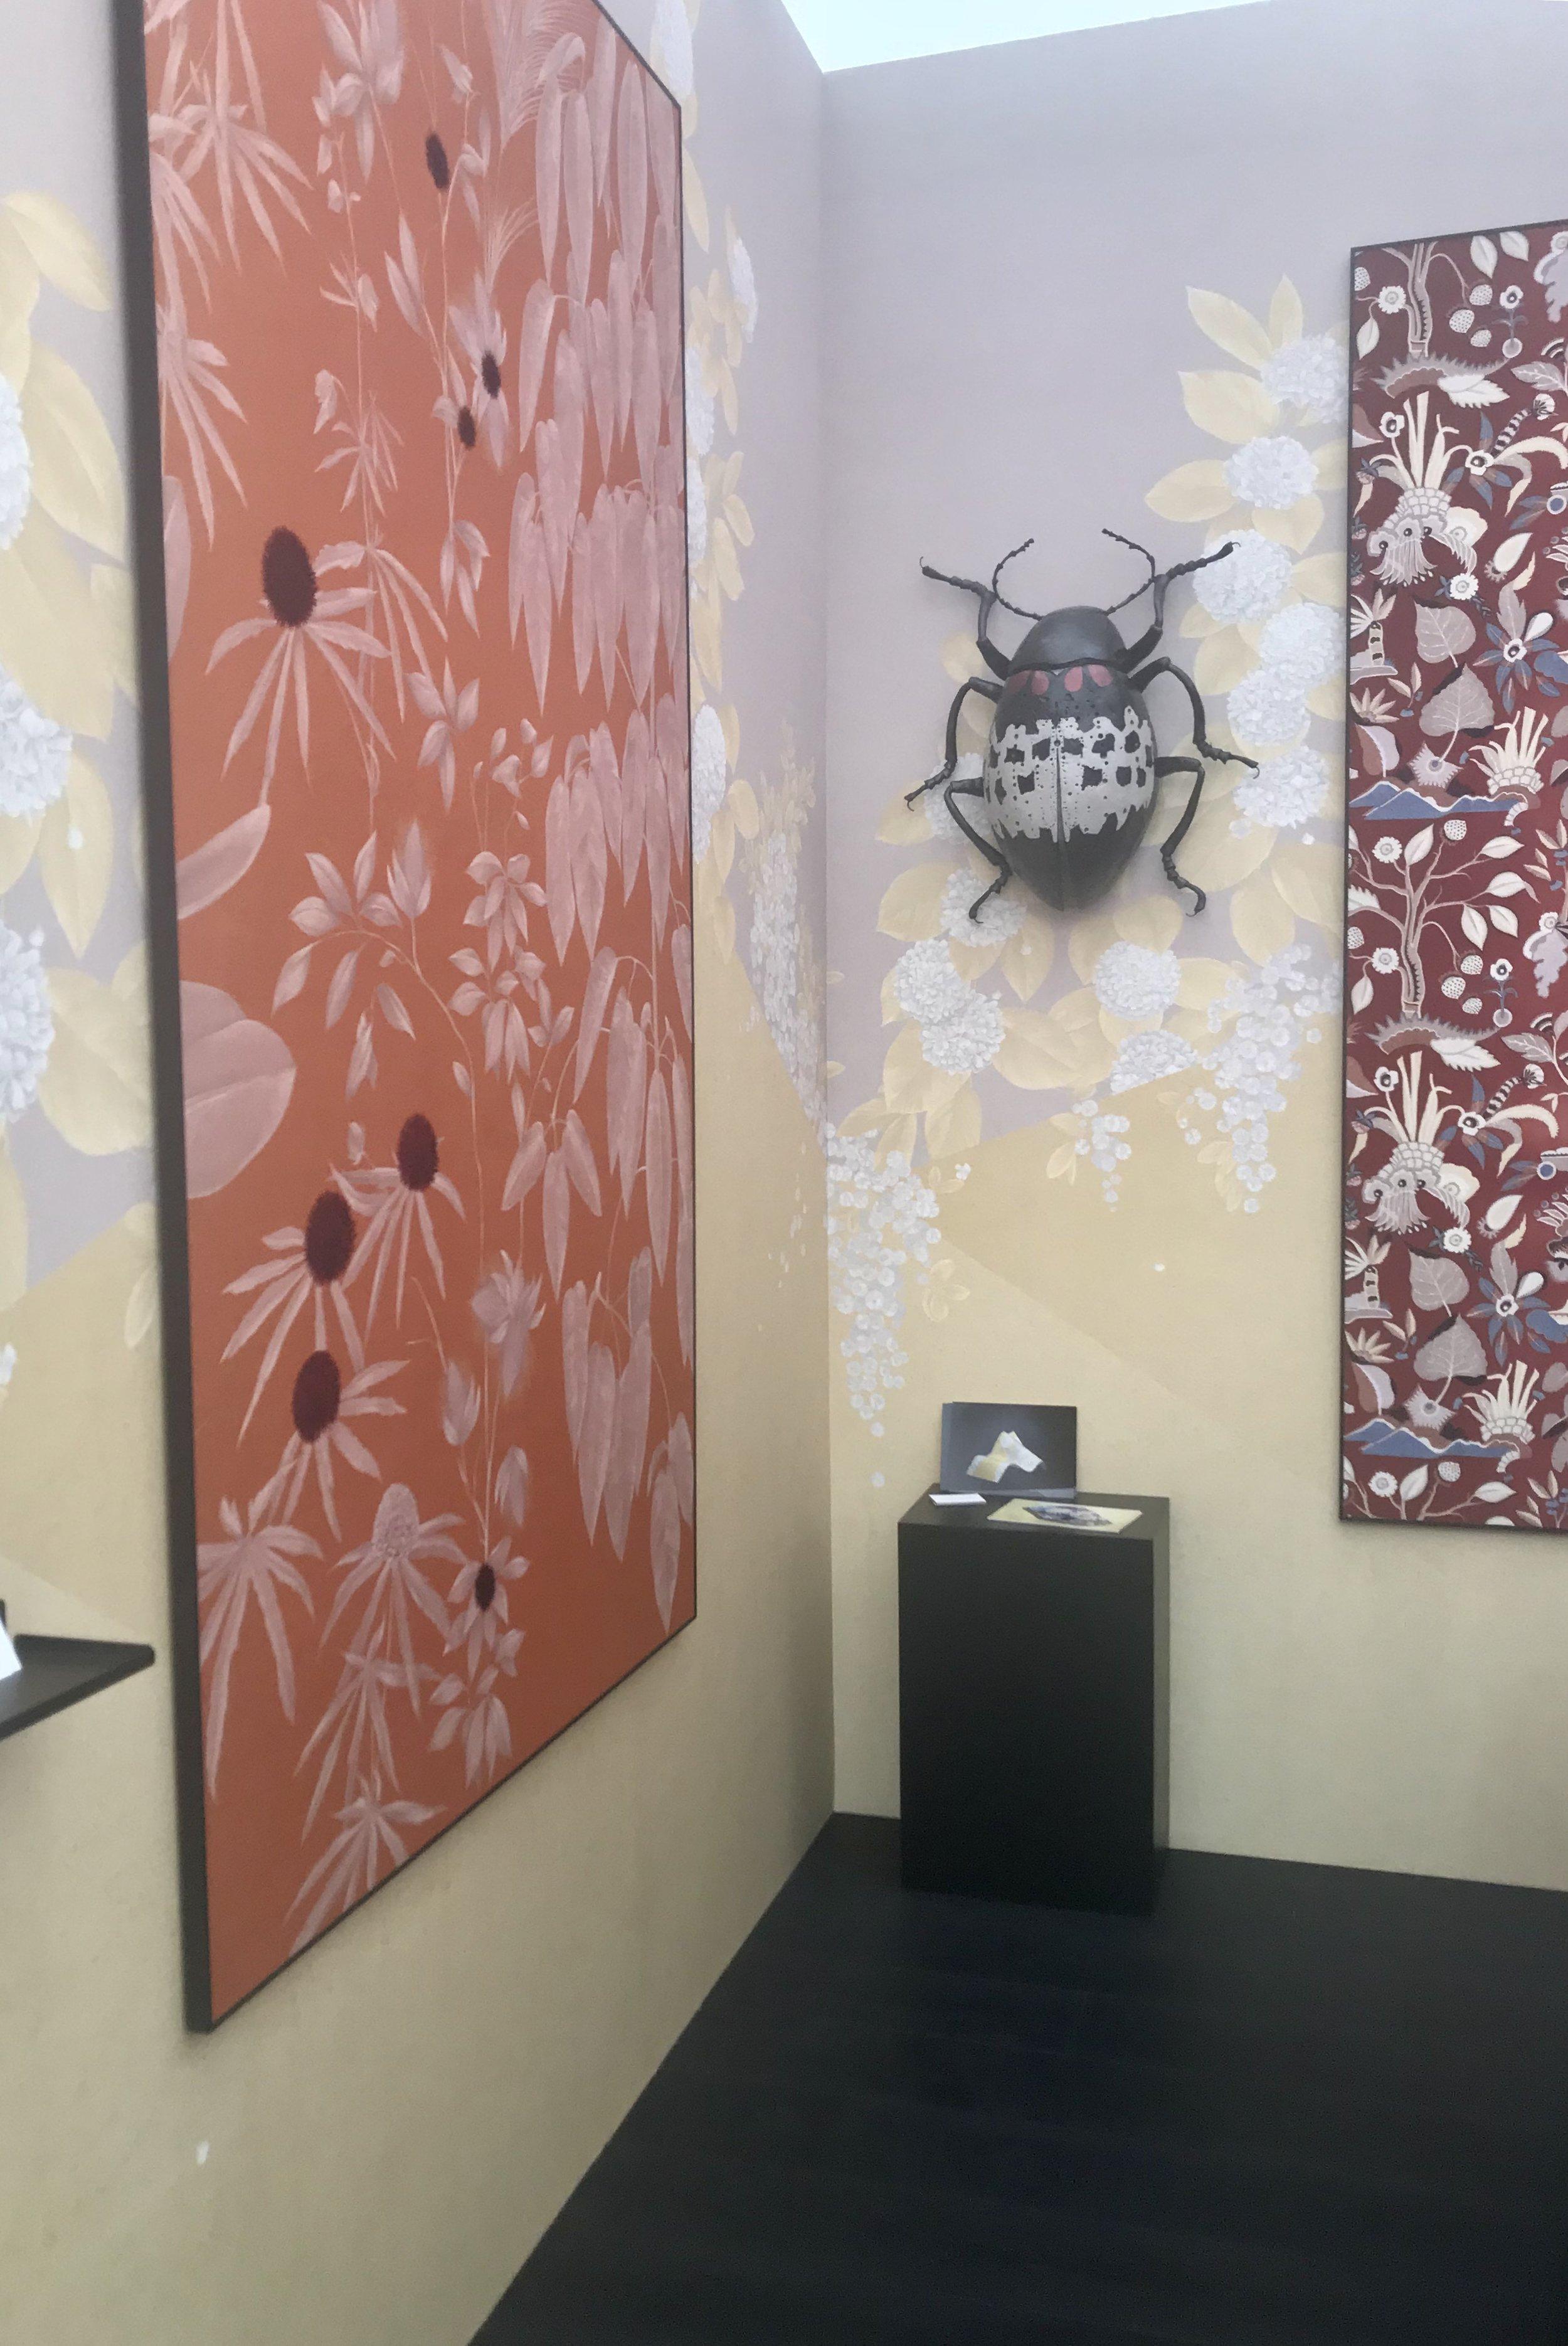 decorex-anna-glover-interiors-wall-fabric-textile-design-impired-lauraloves-design.jpg